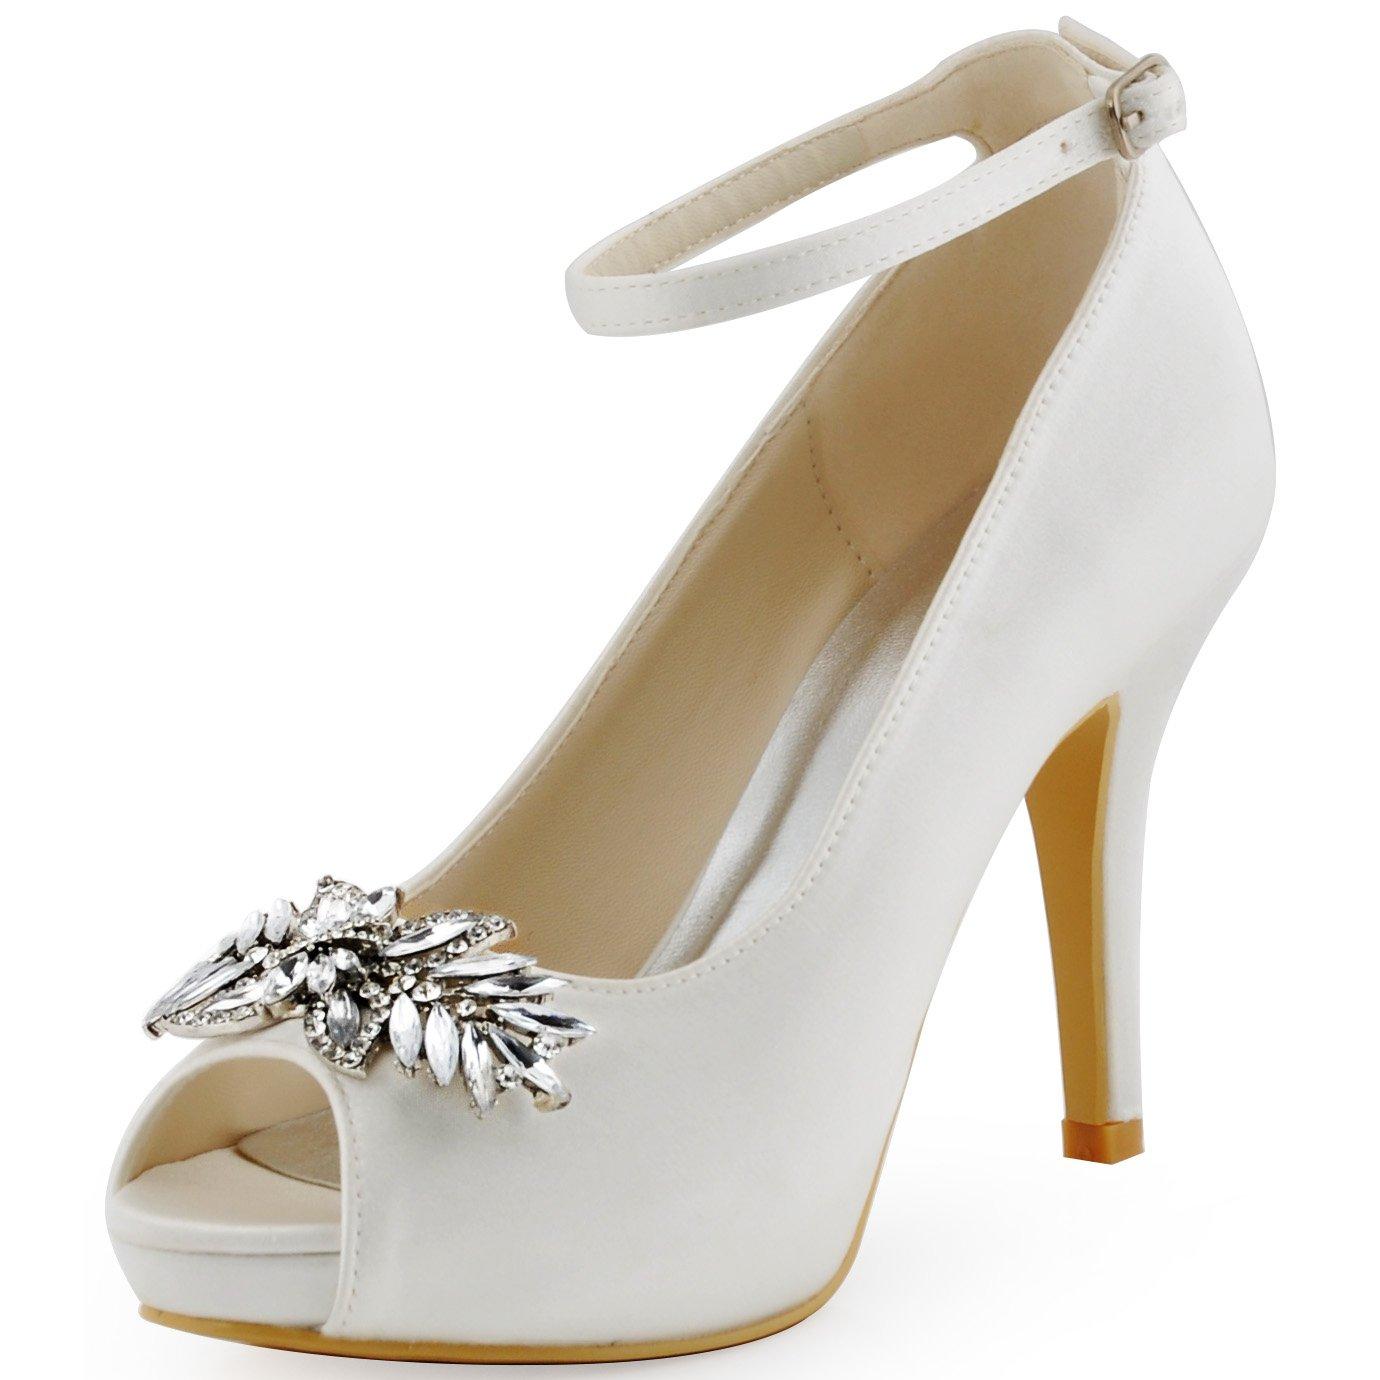 ElegantPark HP1543I Women Peep Toe Pumps High Heel Platform Ankle Strap Satin Wedding Bridal Shoes B014CFAS0K 6 B(M) US|Aa01 White